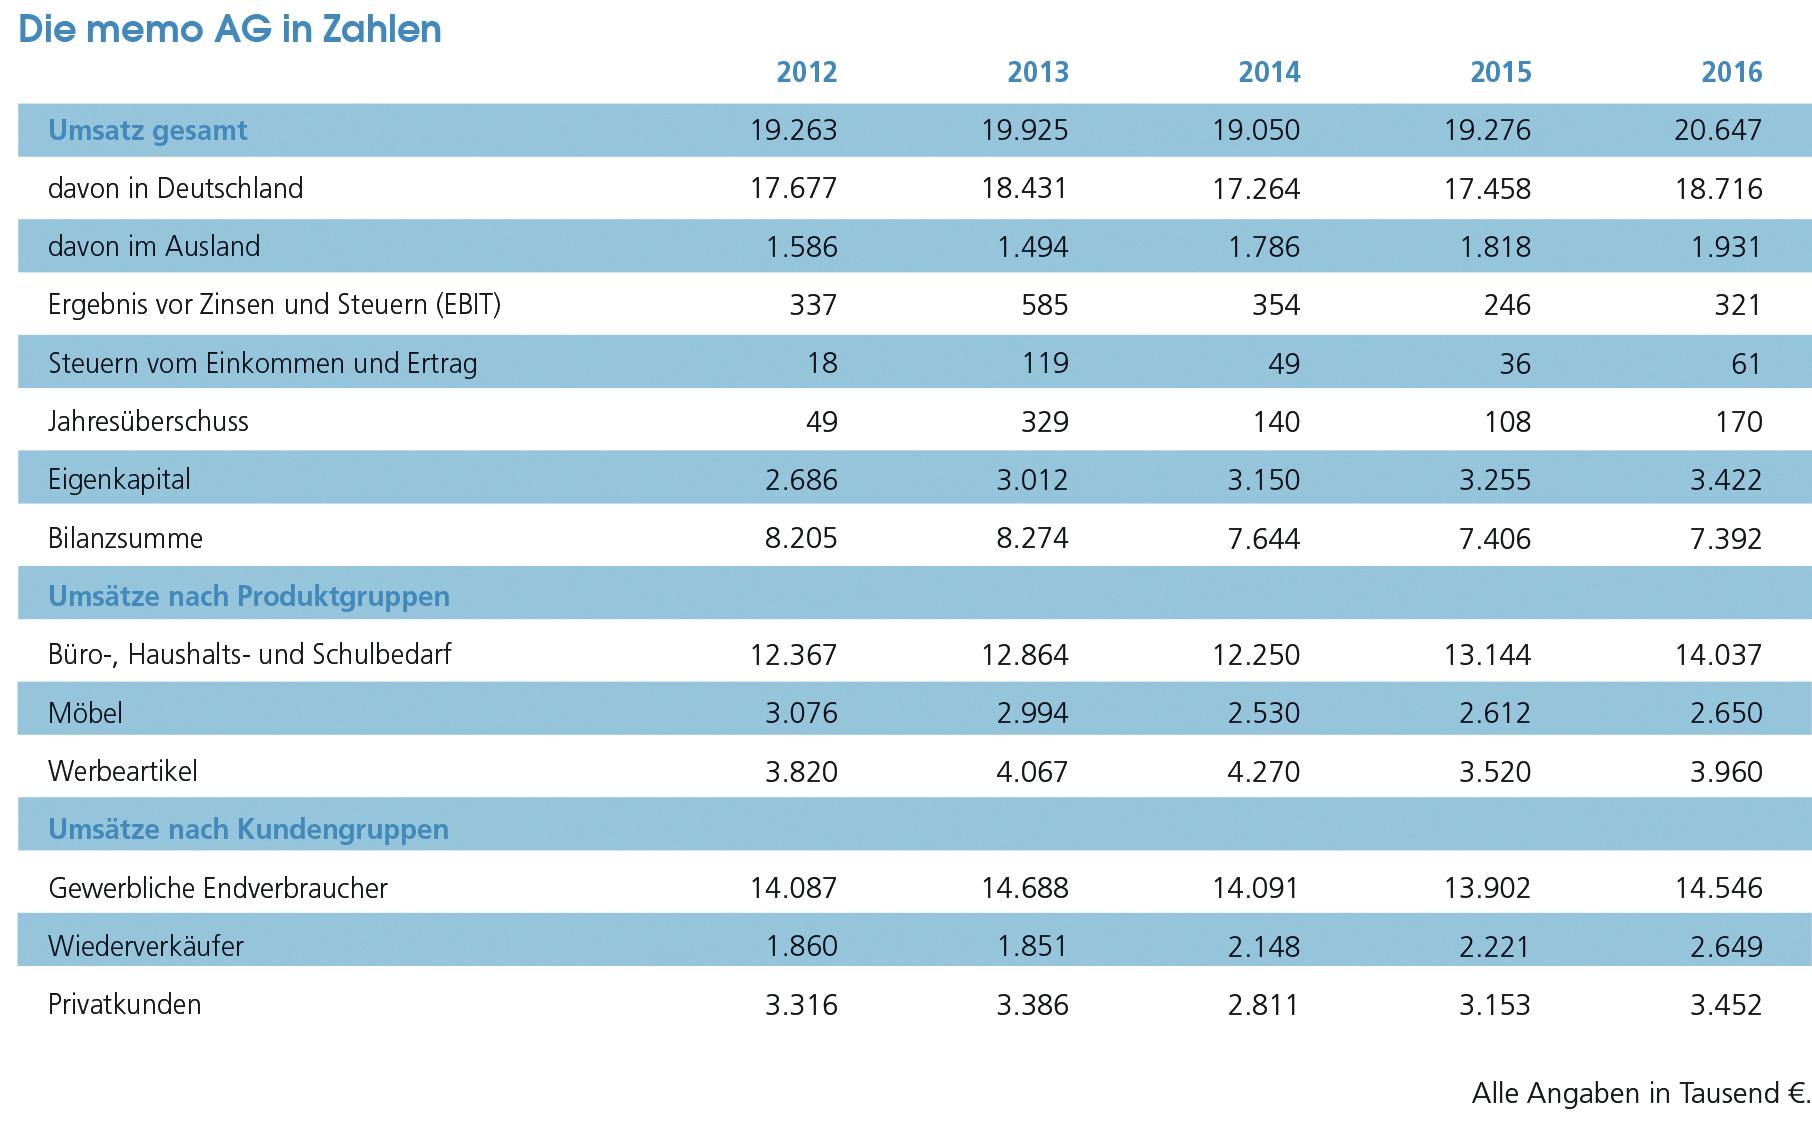 Die memo AG in Zahlen: 2012 - 2016